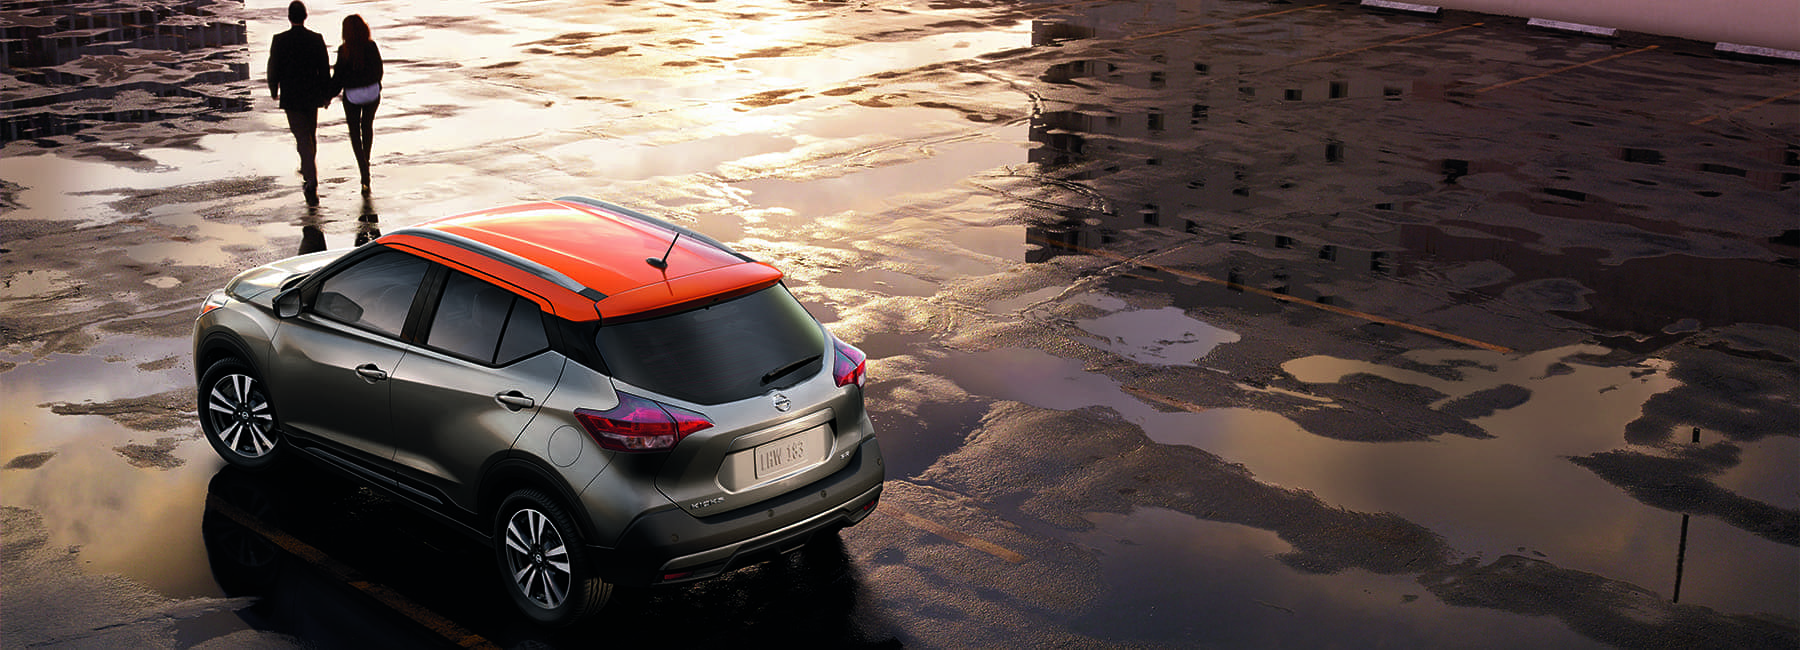 couple walks away from 2020 Nissan Kicks on wet pavement